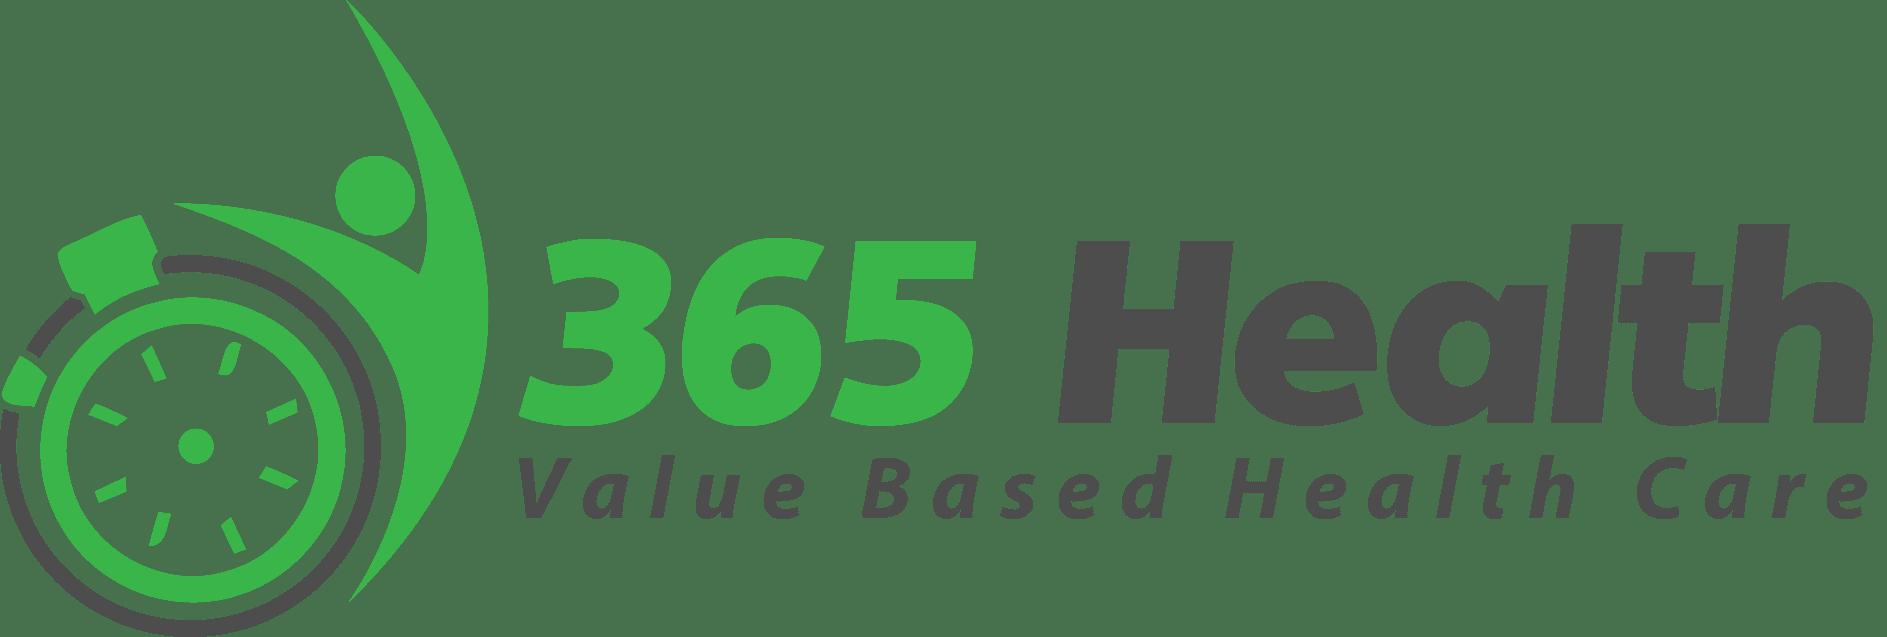 365 Health Care Group